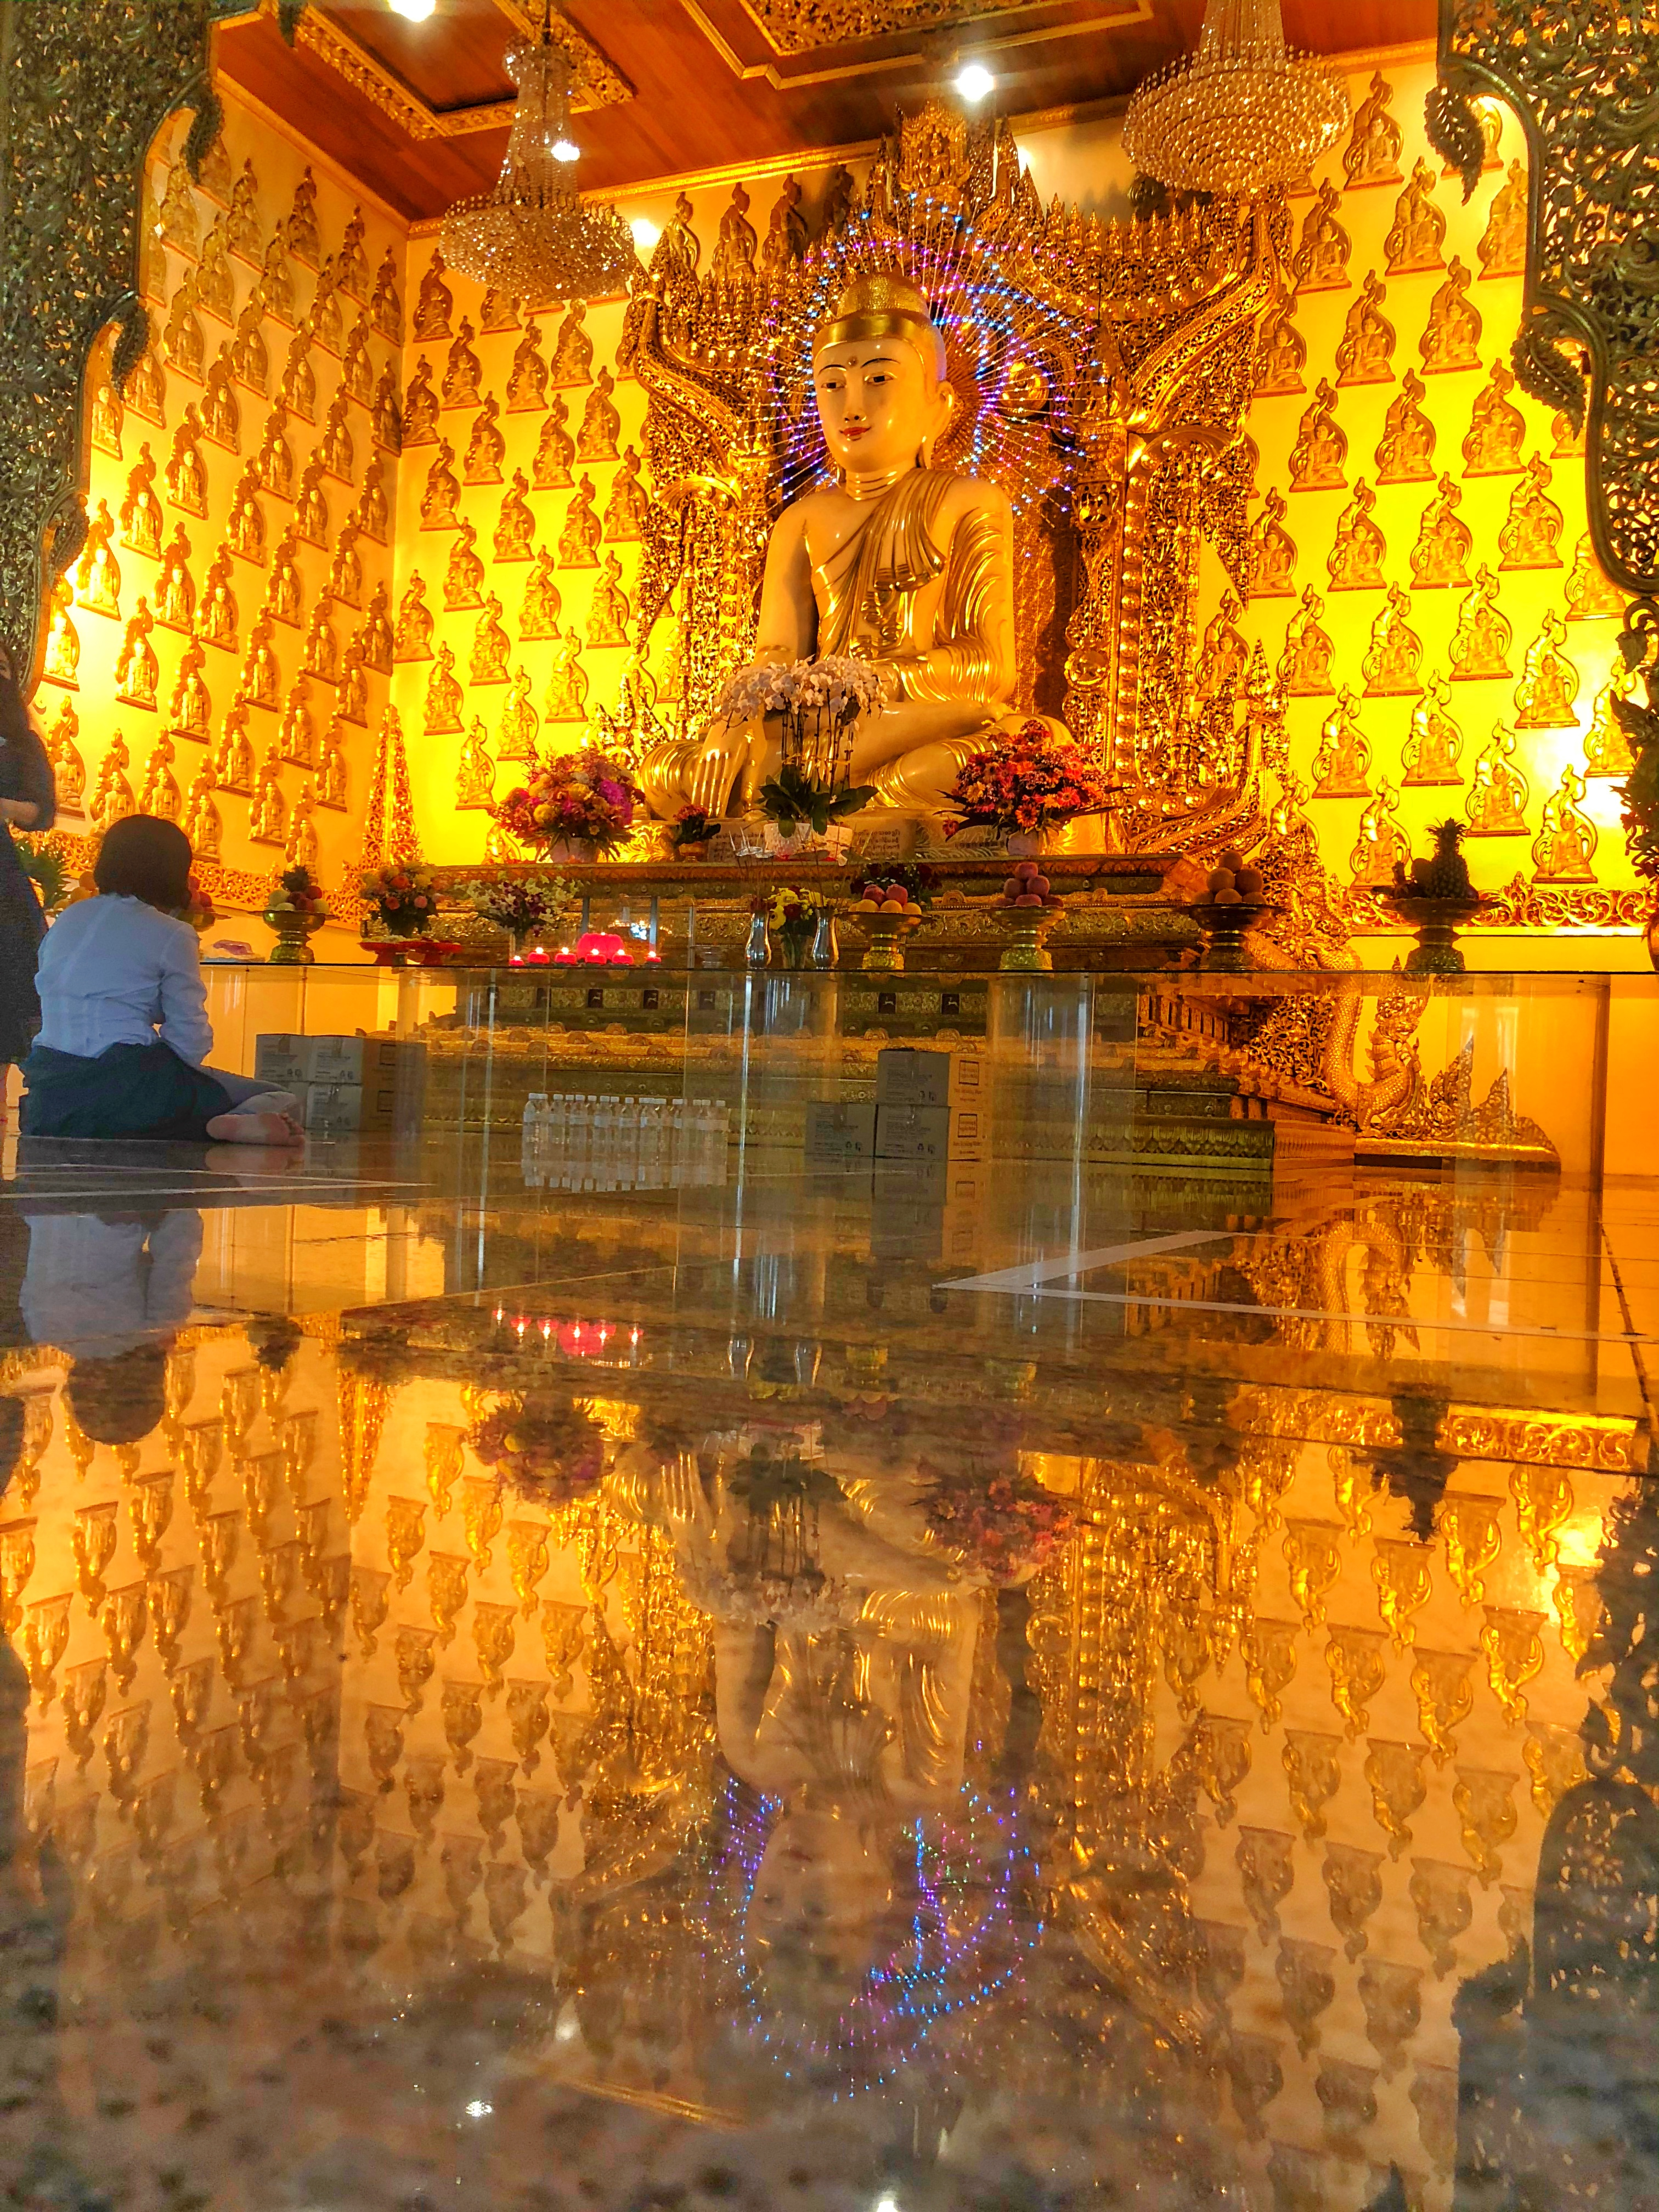 White Marble buddha in Maha Sasana Ramsi Burmese Buddhist Temple